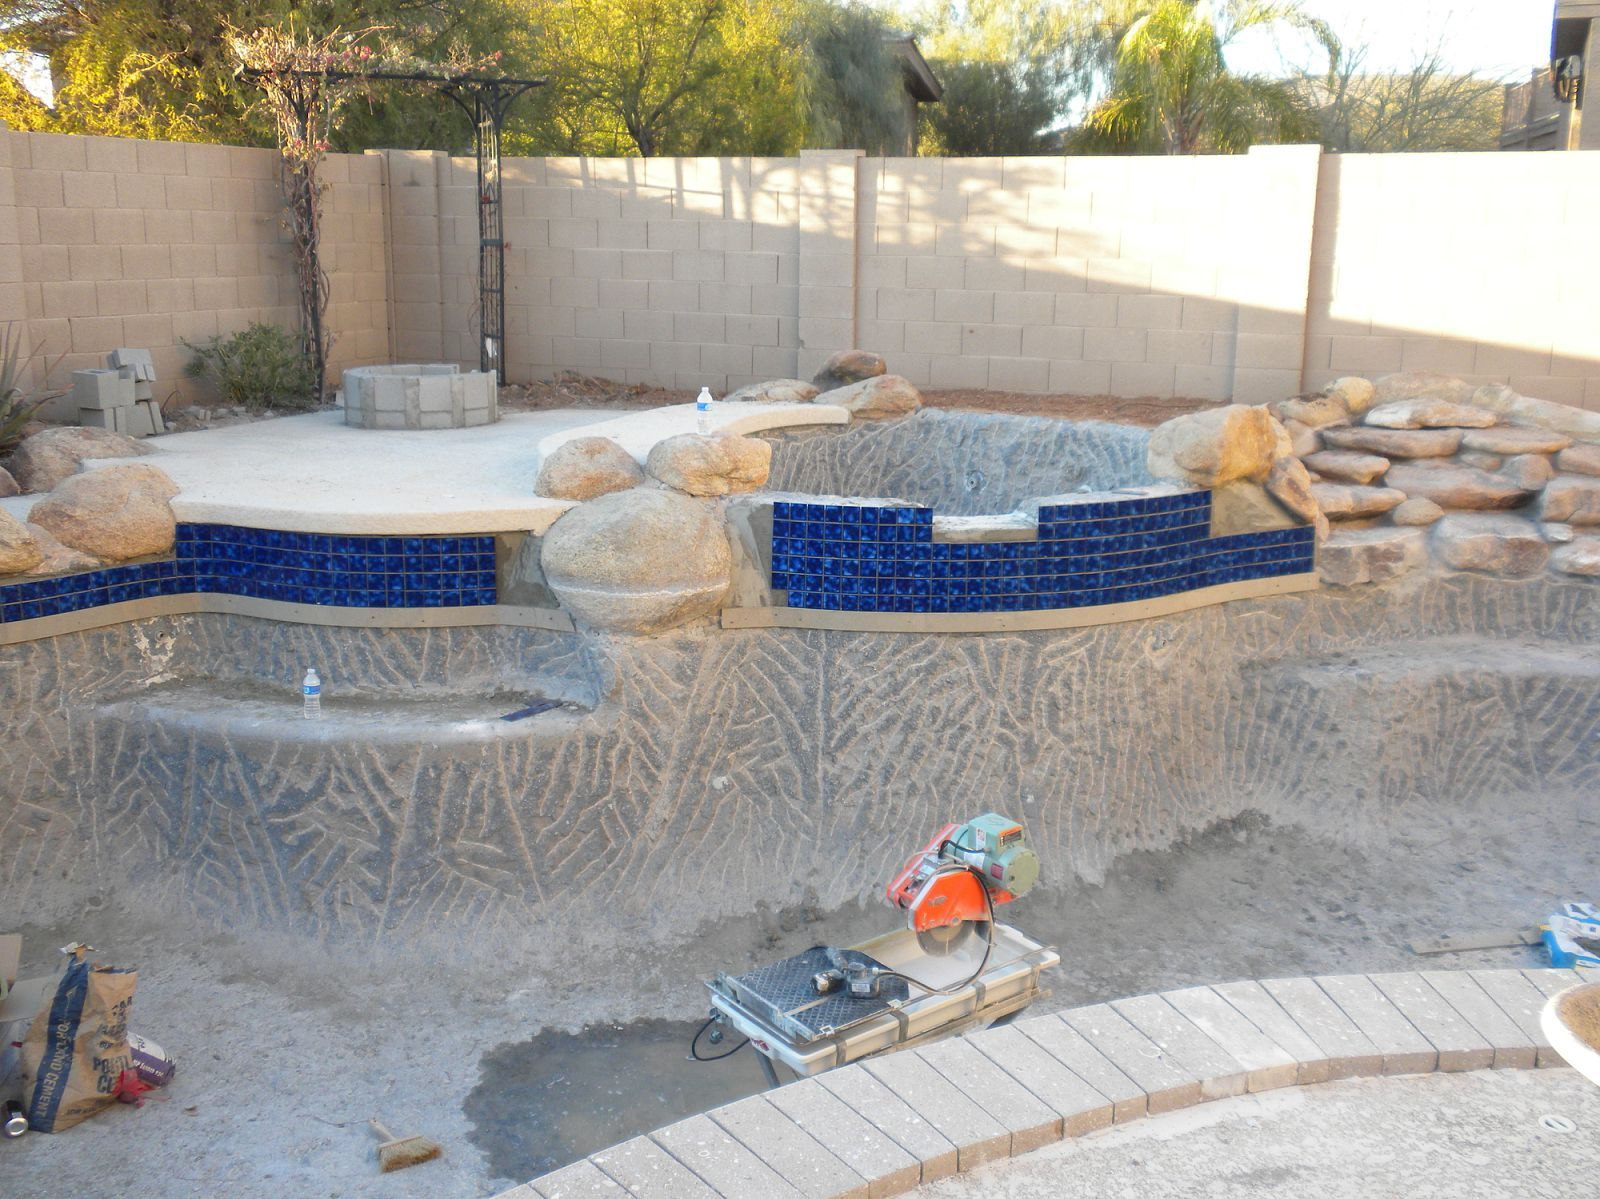 Pool Waterline Tile Ideas pool tile for sale surprising on home furnishing ideas small 34 mosaic waterline tile 2 Pool Remodel Week 1